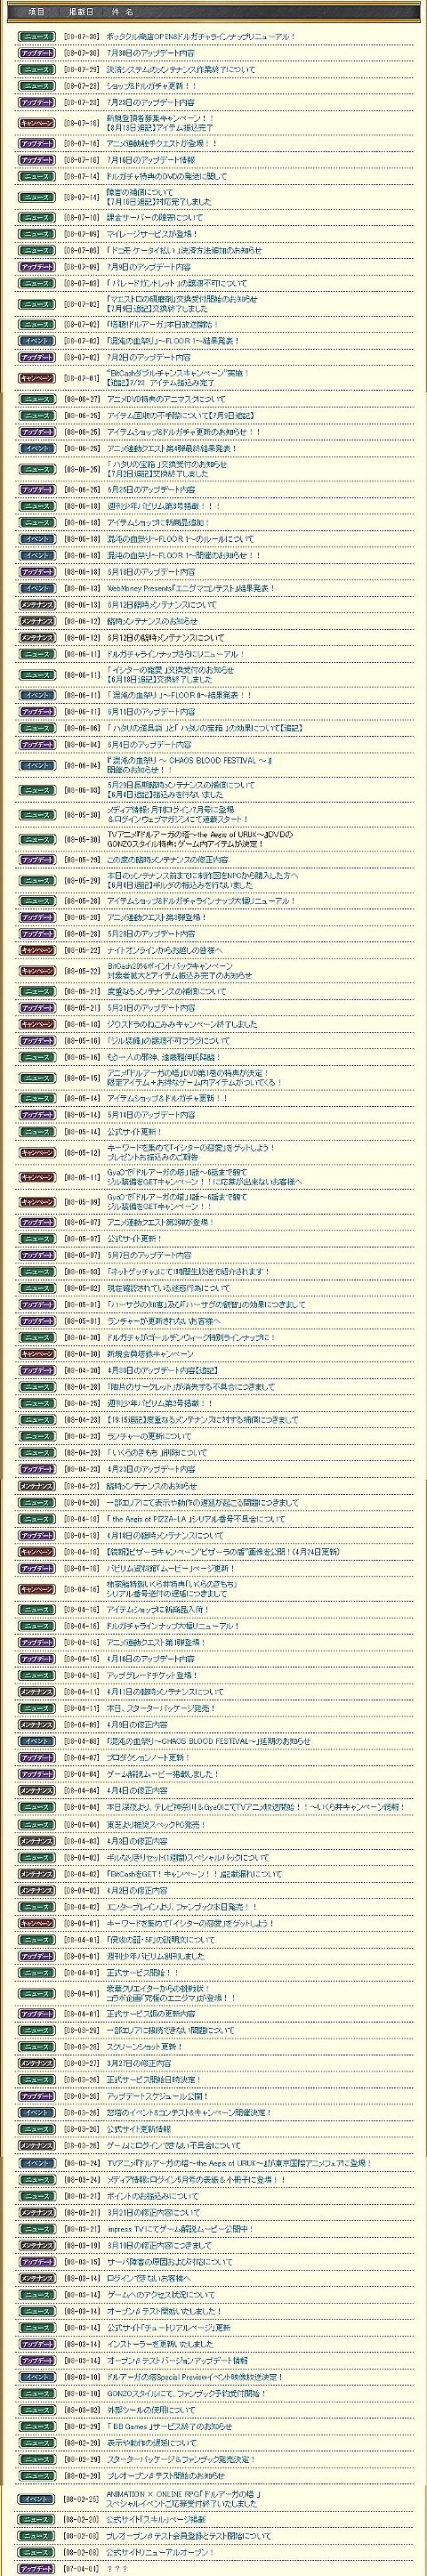 2008-01A.jpg